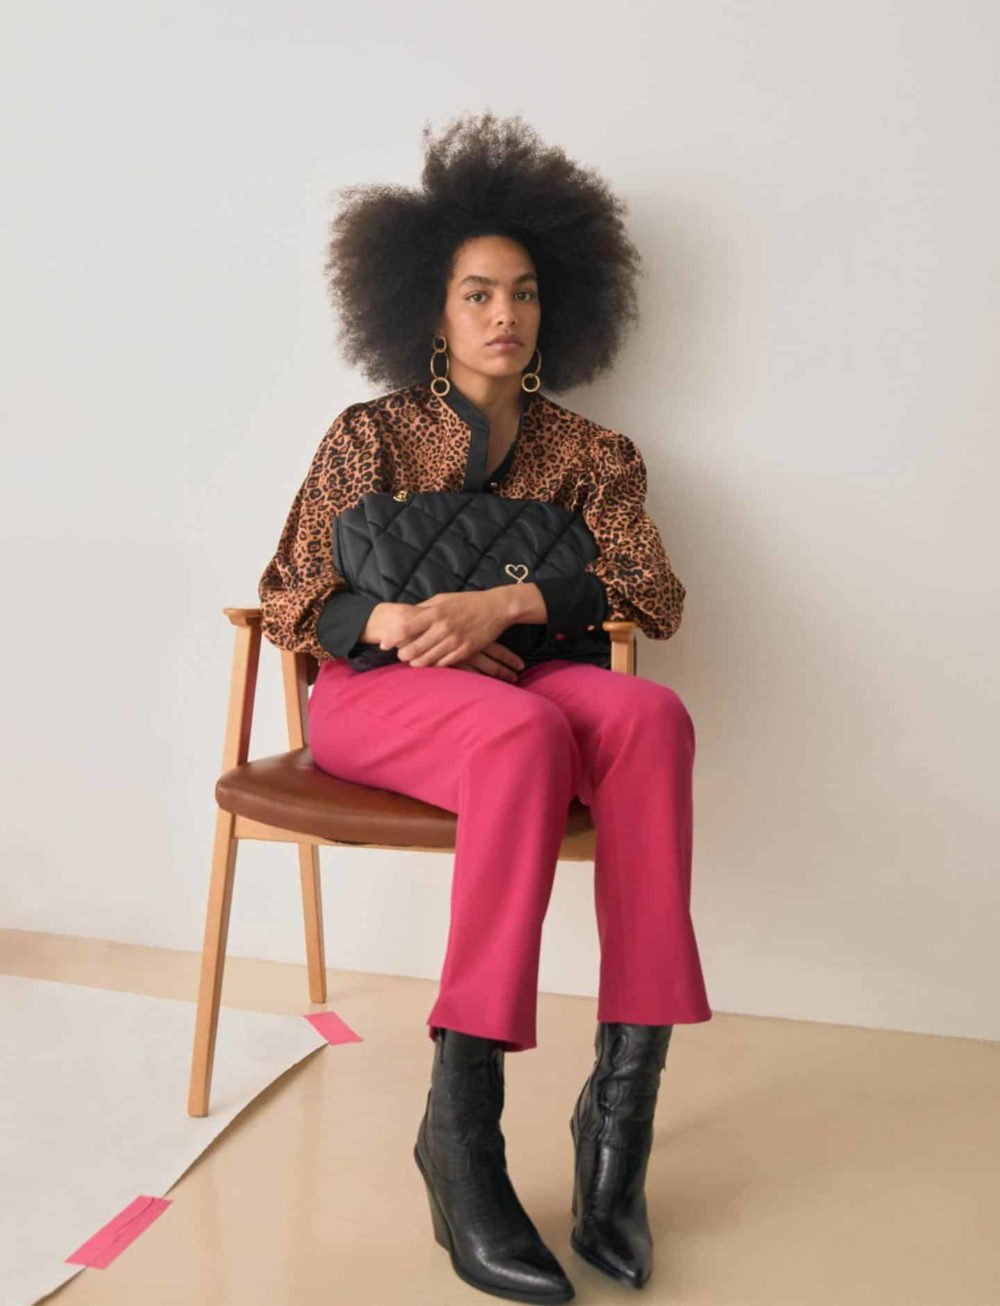 blusa-saten-animal-print-outfit